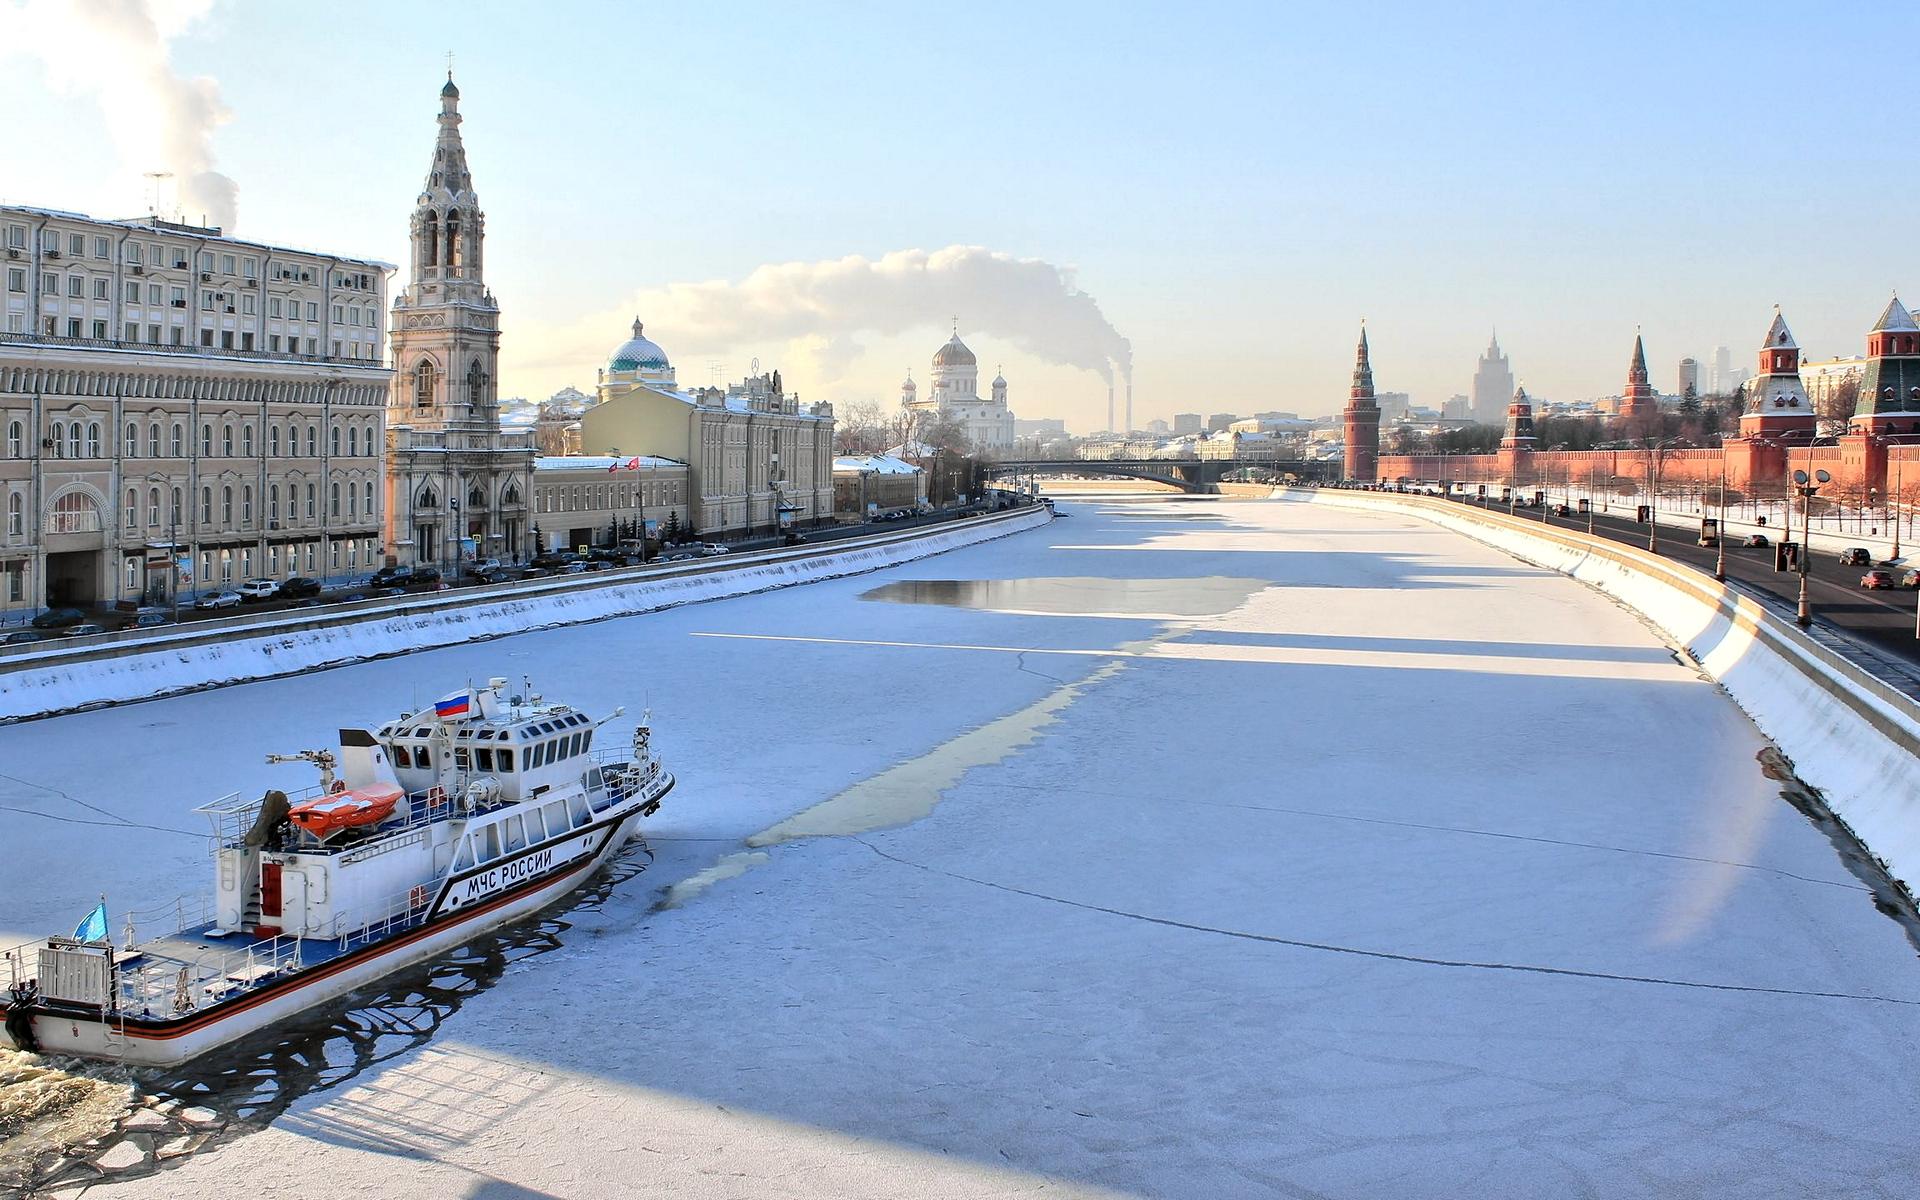 Открытки добрый, картинки москва зимой 2018